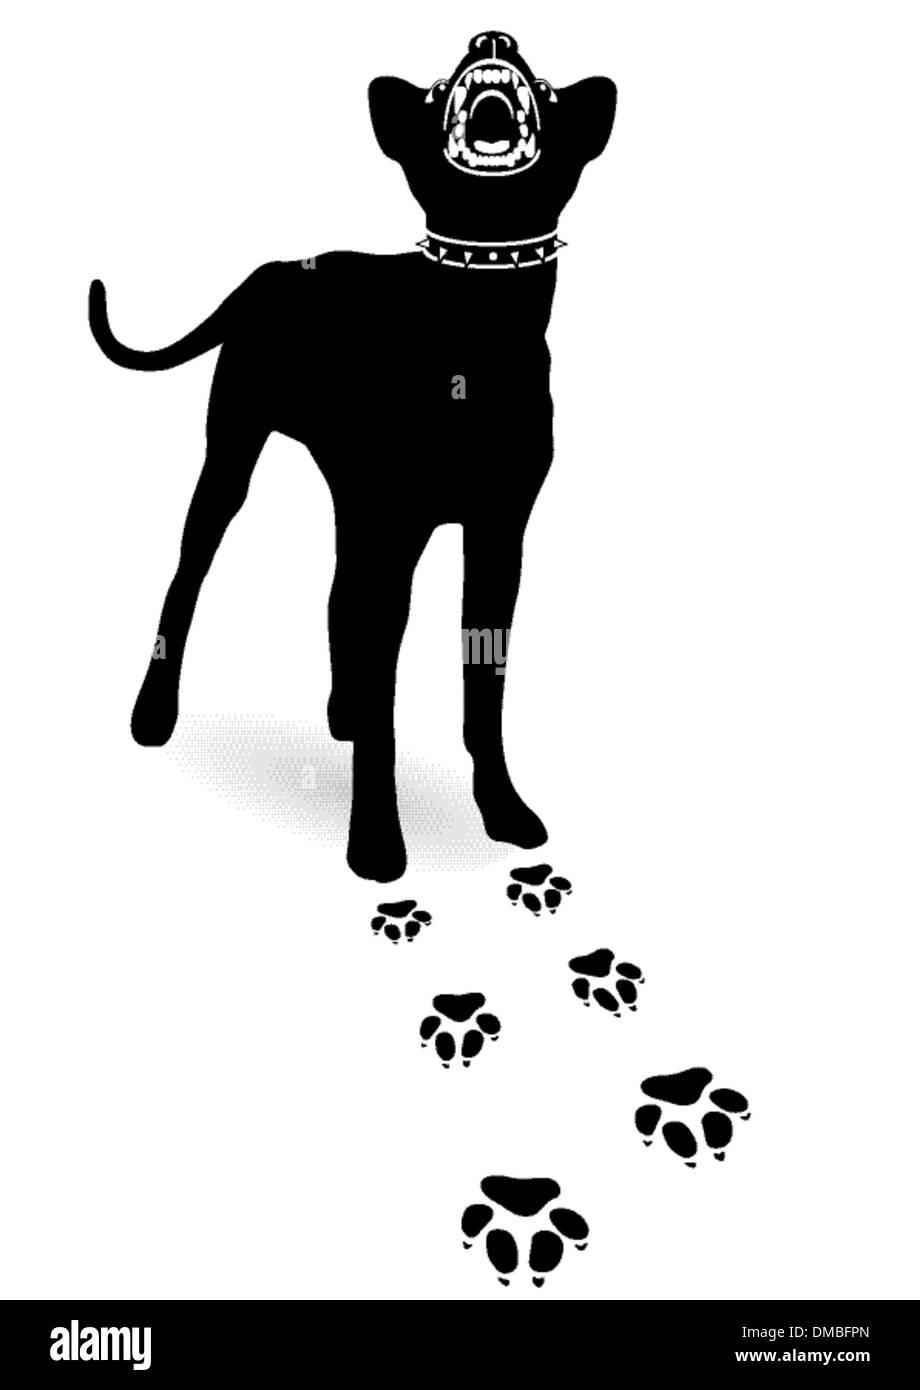 Caution dangerous dog - Stock Vector